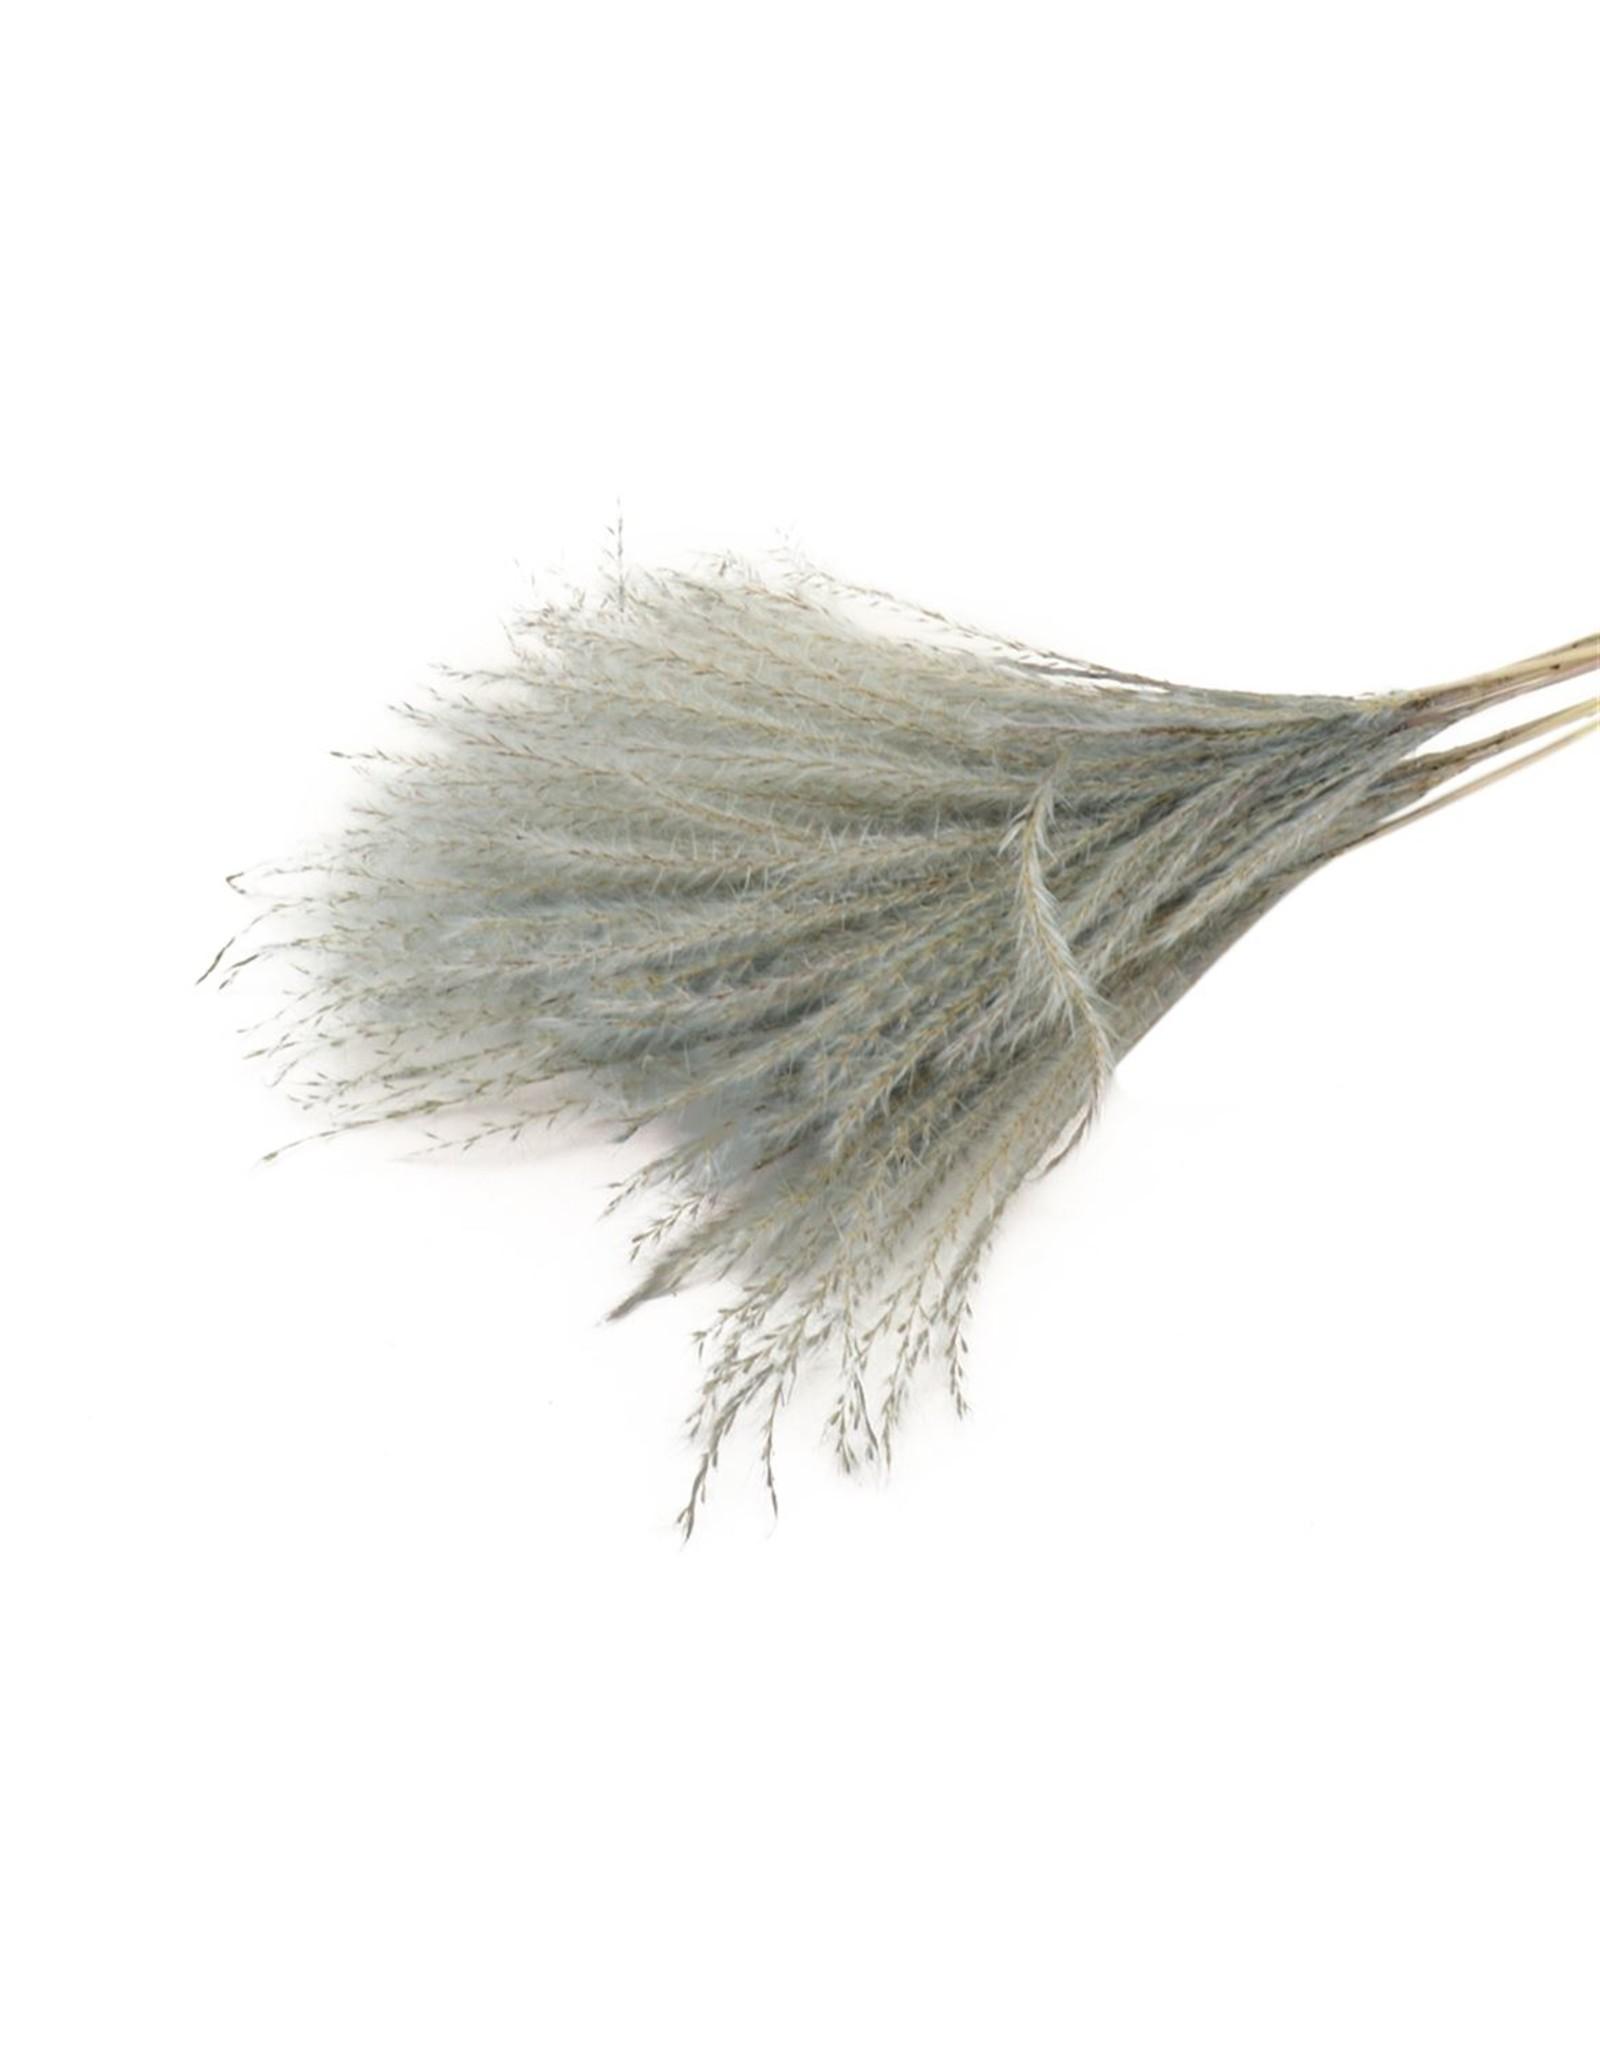 HD Bündel Fluffy Silver Grass 10pc Slv  ↑75.0 (x 25)